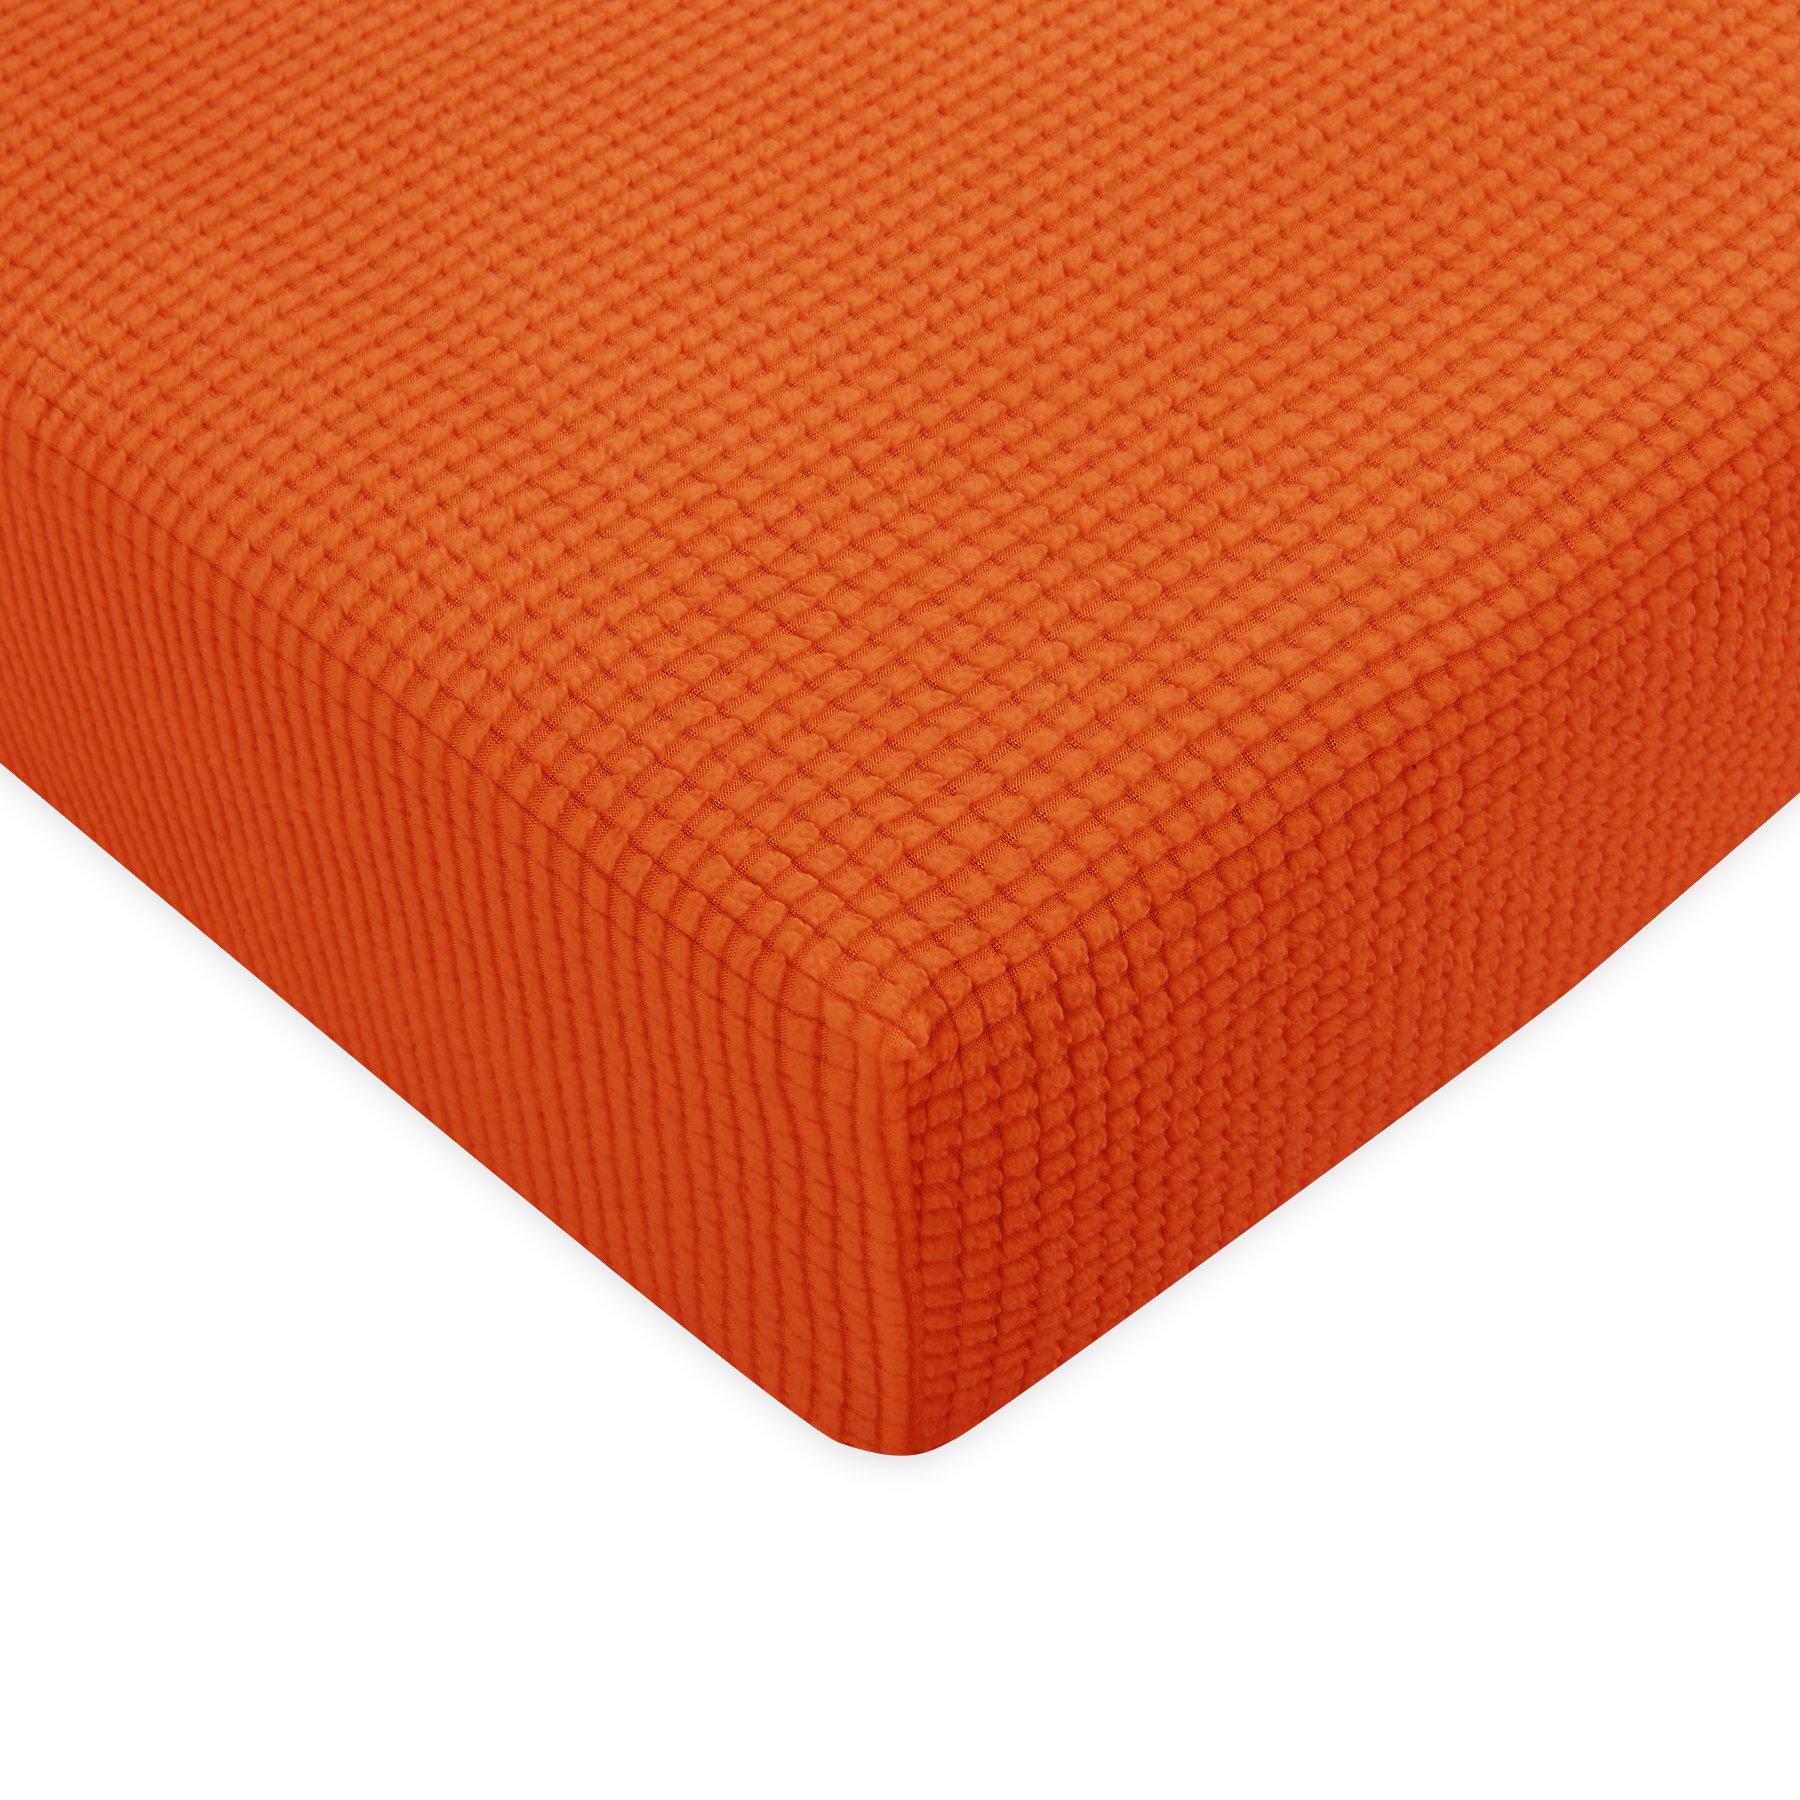 Subrtex Stretch Spandex Protector Slipcover (Sofa Cushion, Orange)